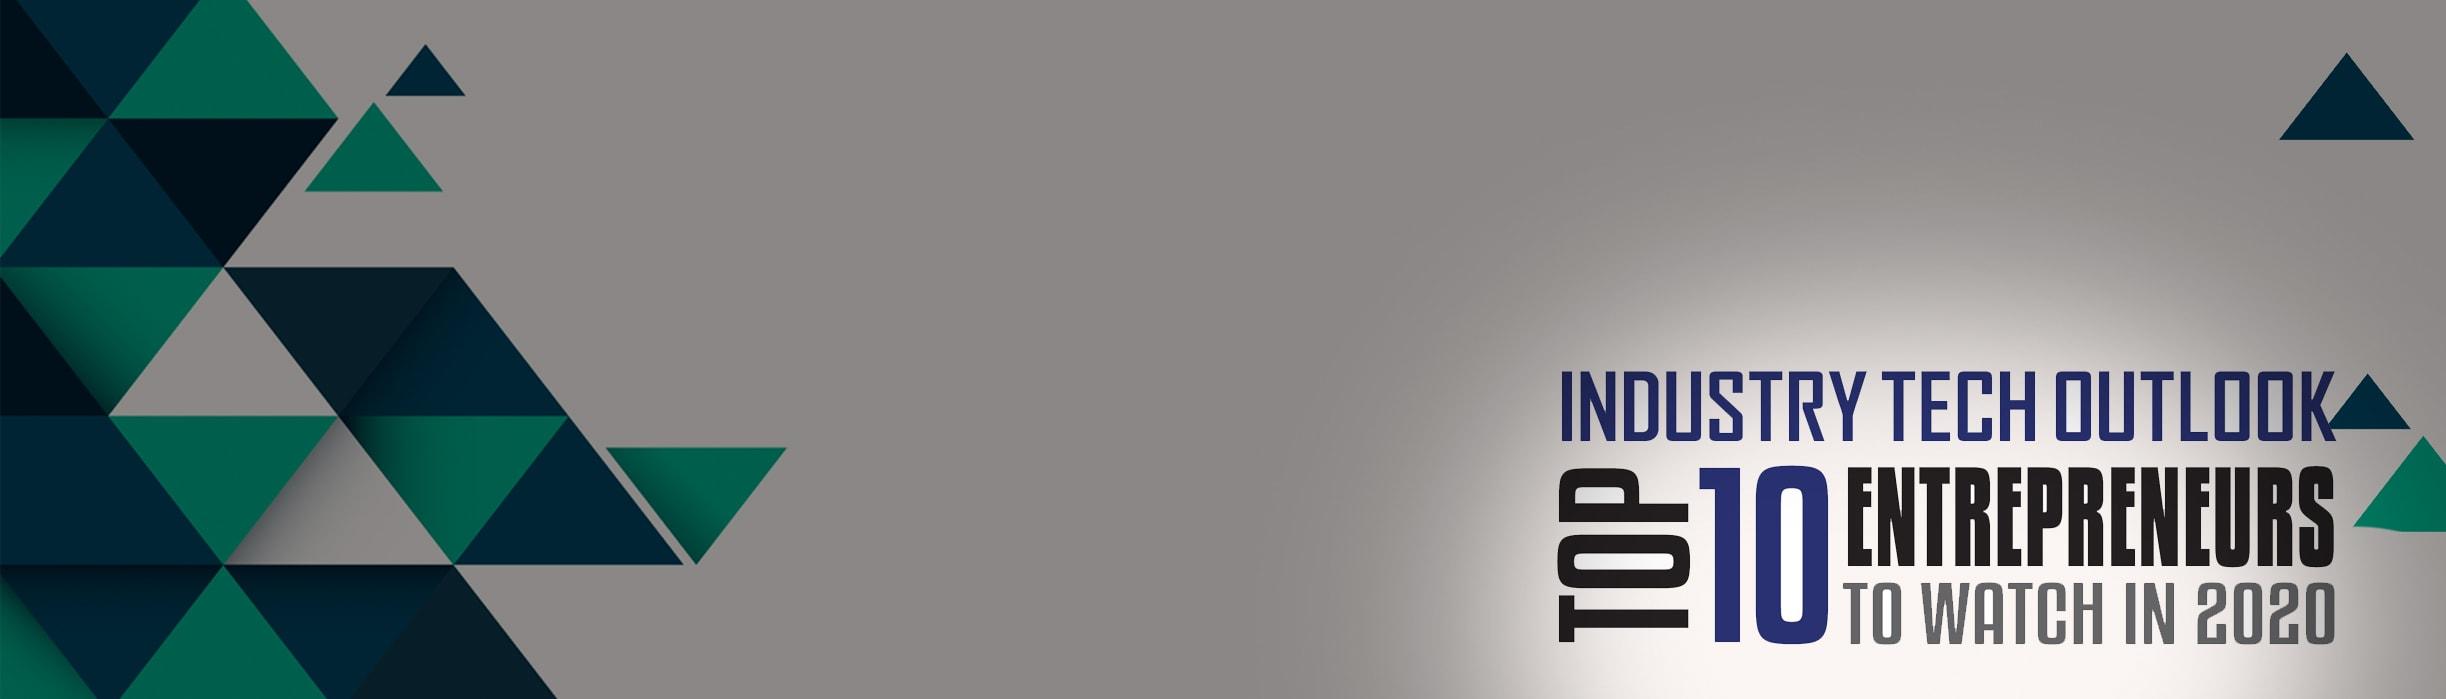 Cavisson's Anil Kumar - Top 10 Enterpreneurs to watch in 2020 by Industry Tech Outlook Magazine